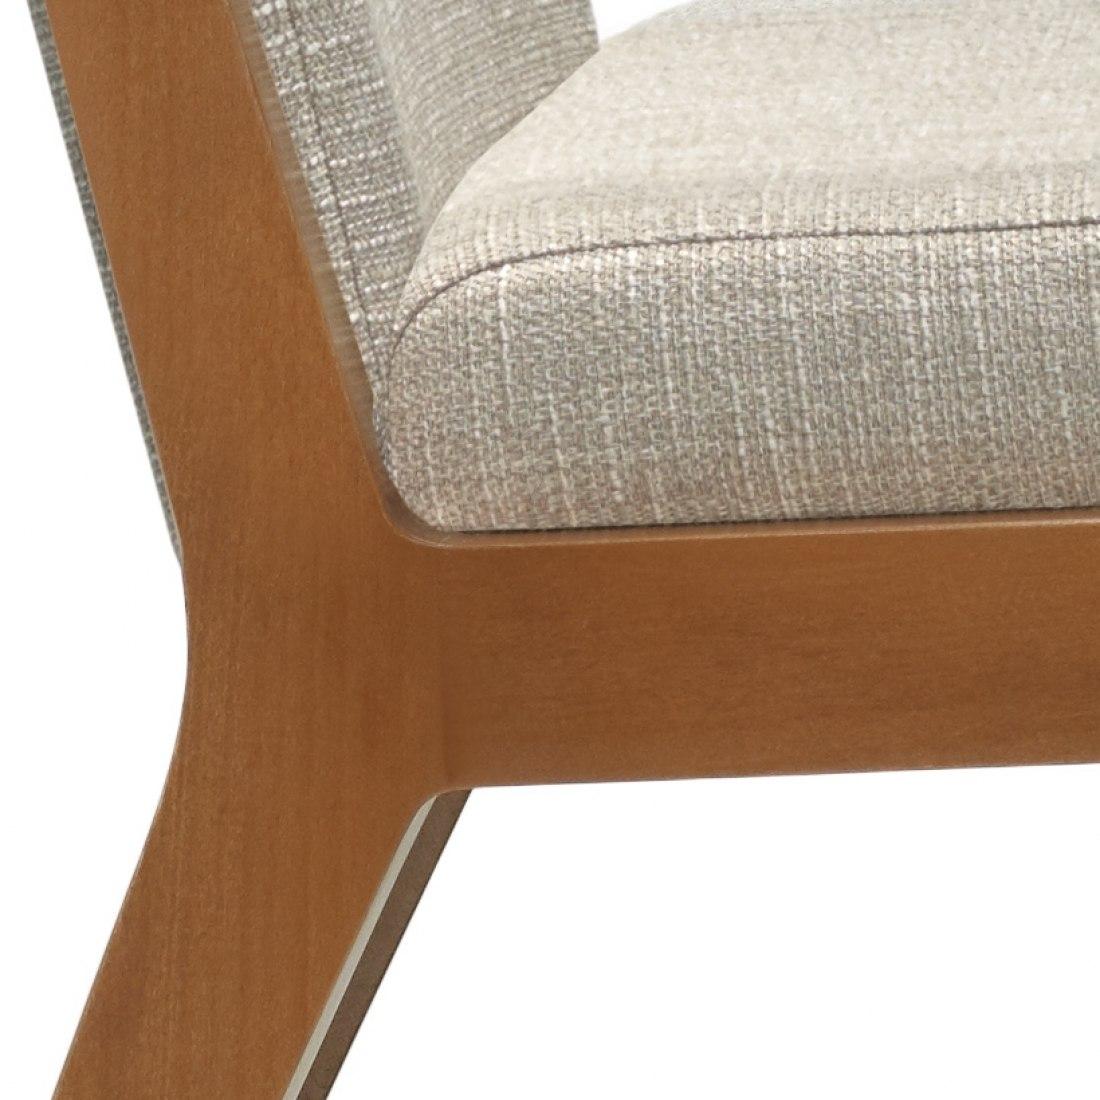 global chap chair 1010 wall saver design